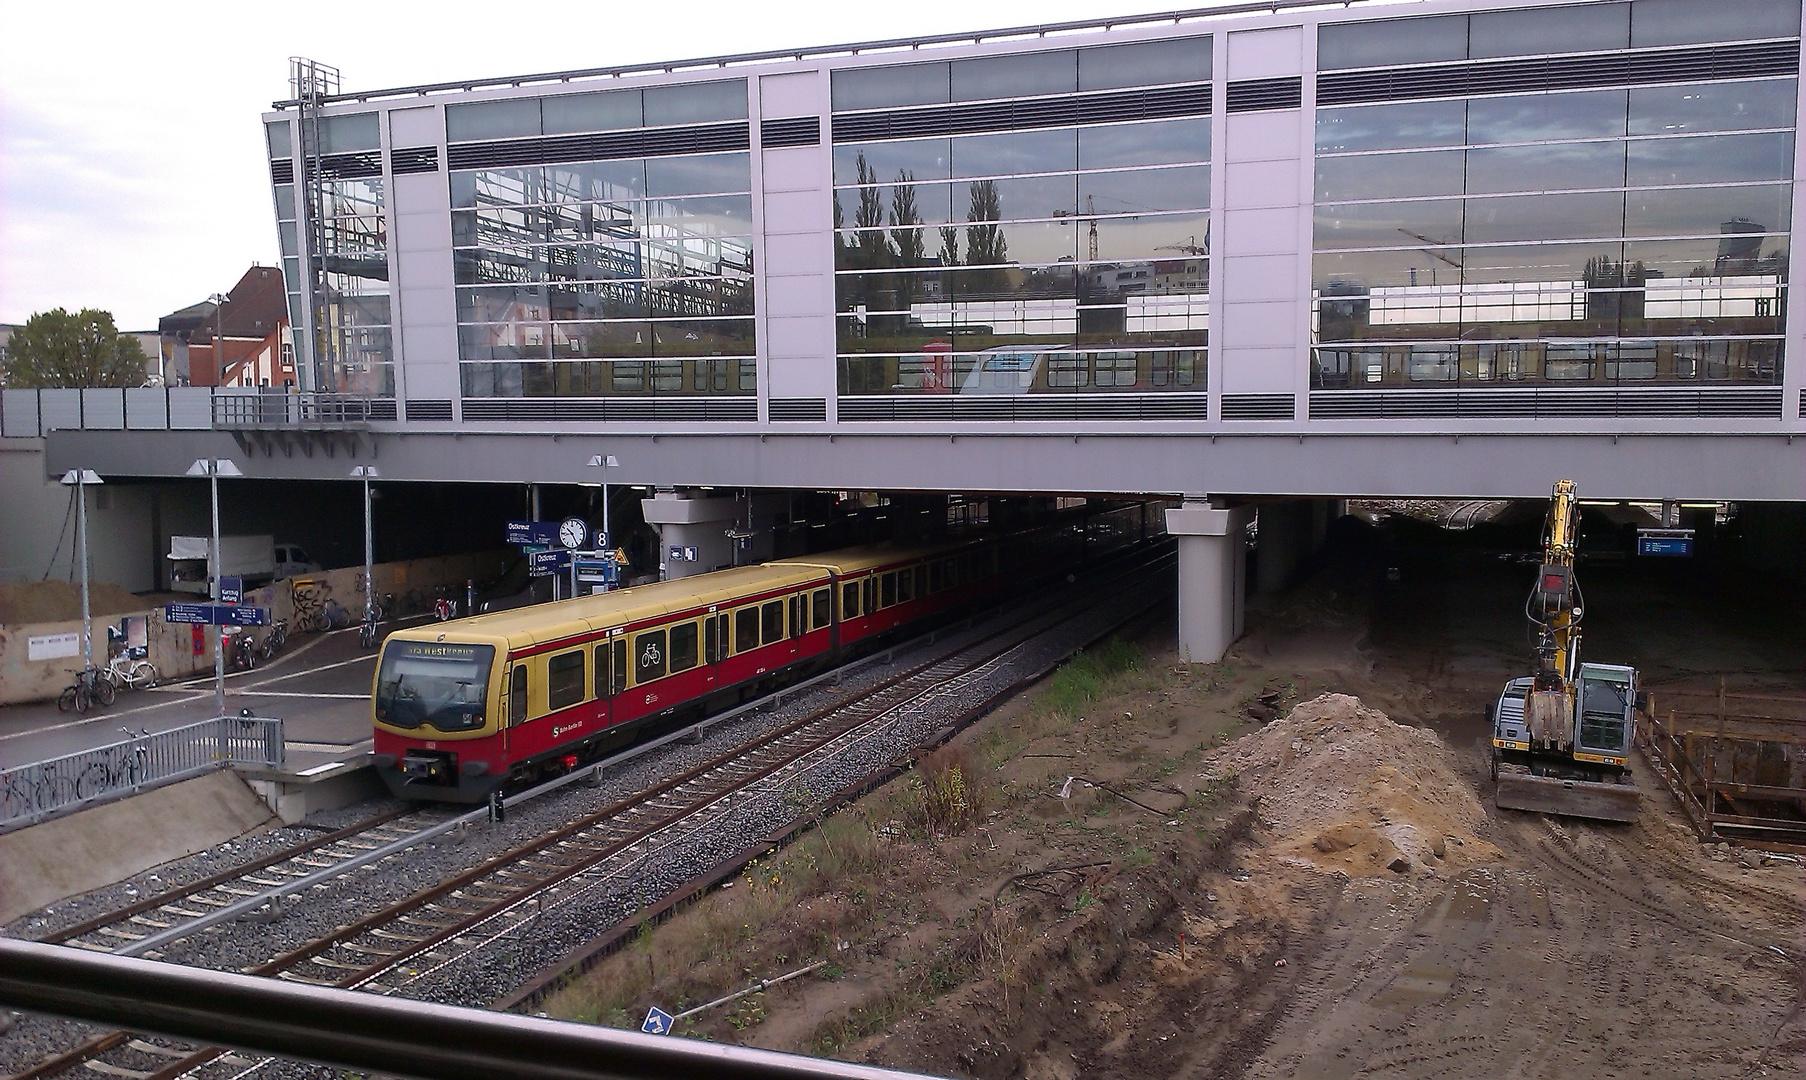 Baustelle S-Bahnhof Ostkreuz - stadteinwärts fahrende S-Bahn